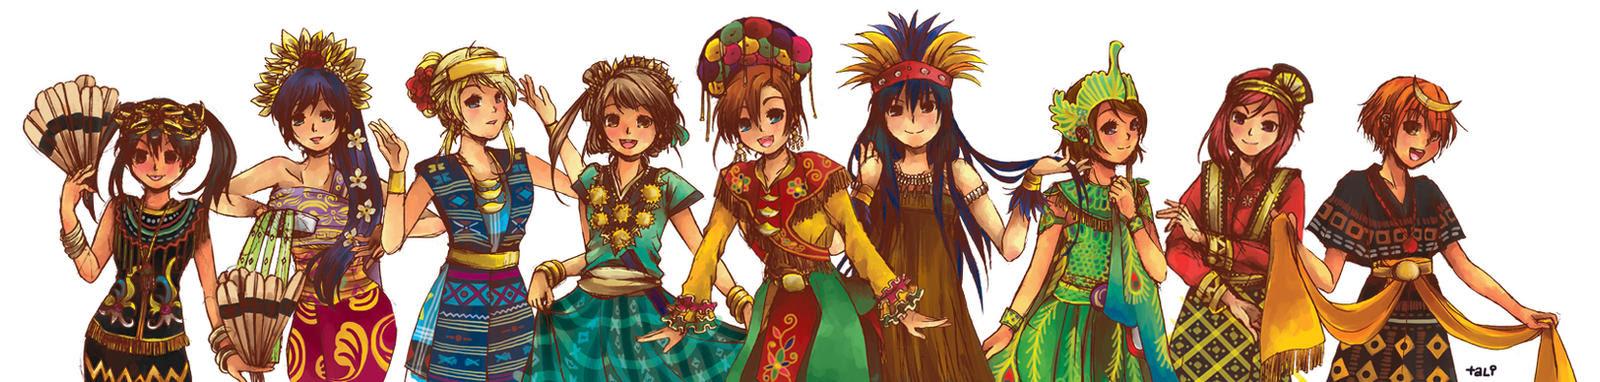 Love Live!  Indonesia Traditional Dances by SmartChocoBear on DeviantArt